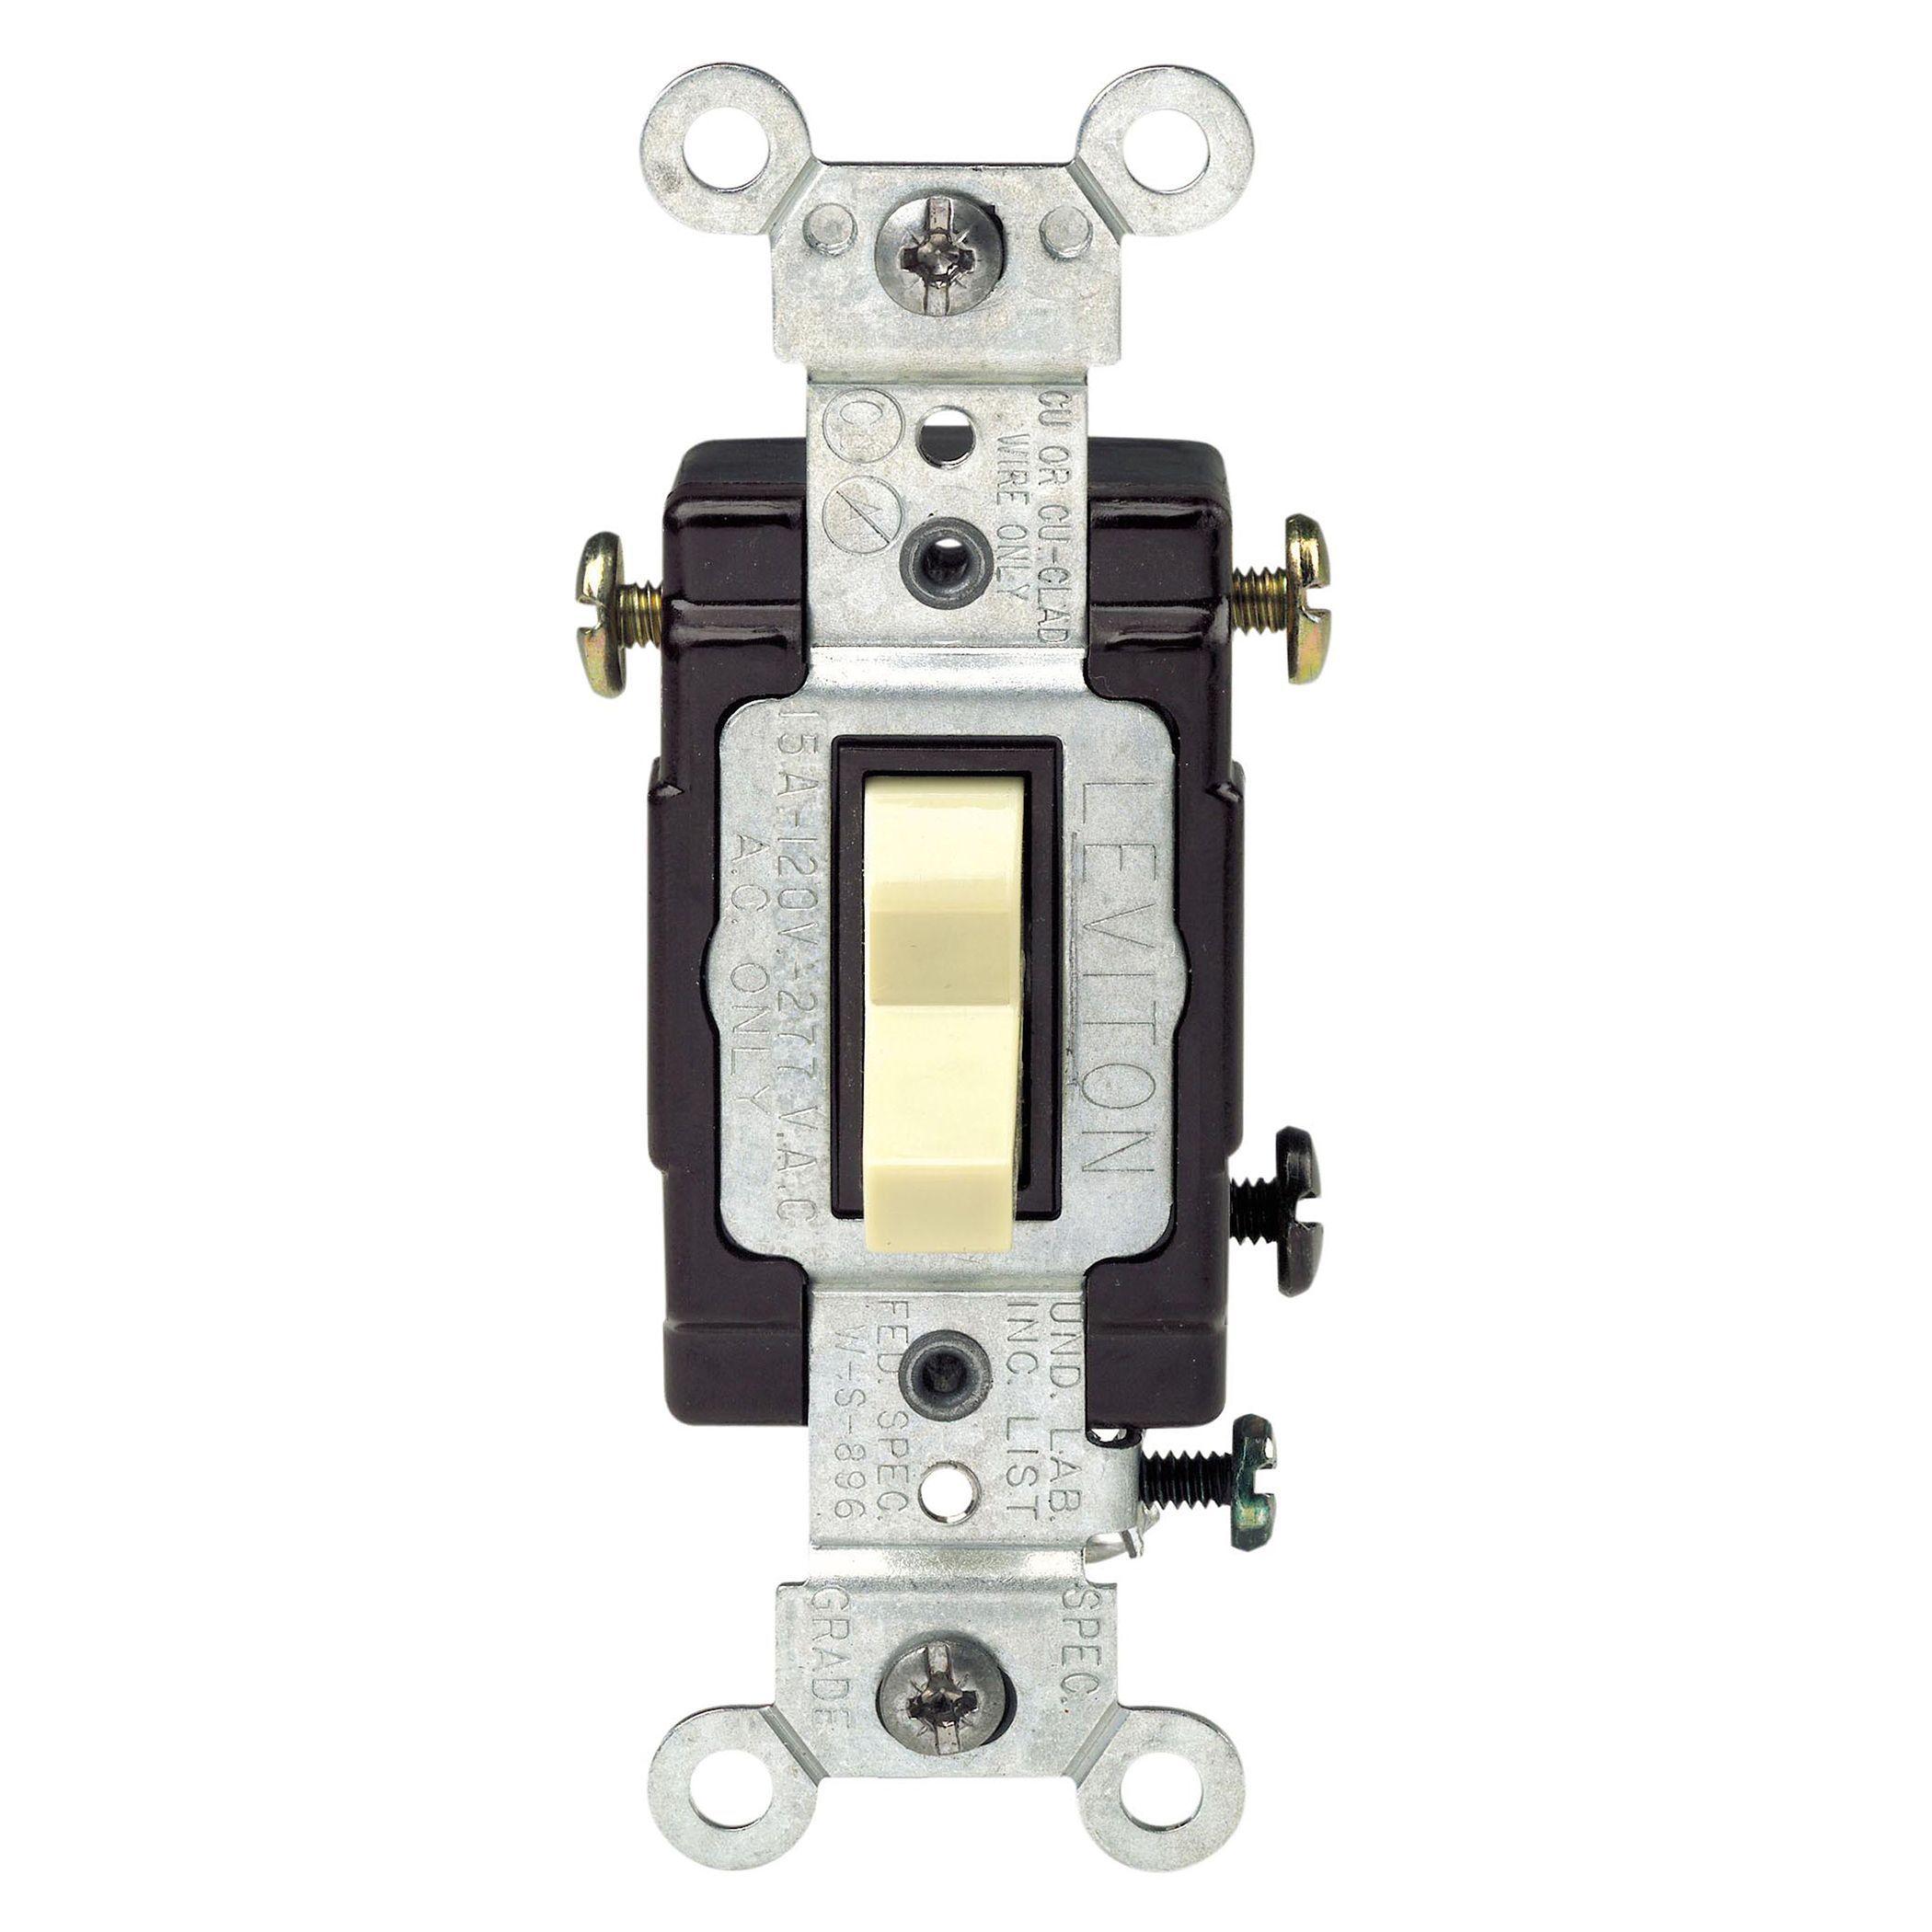 Leviton 120 Volt Ivory Illuminated 3 Way Light Switch (Other ...